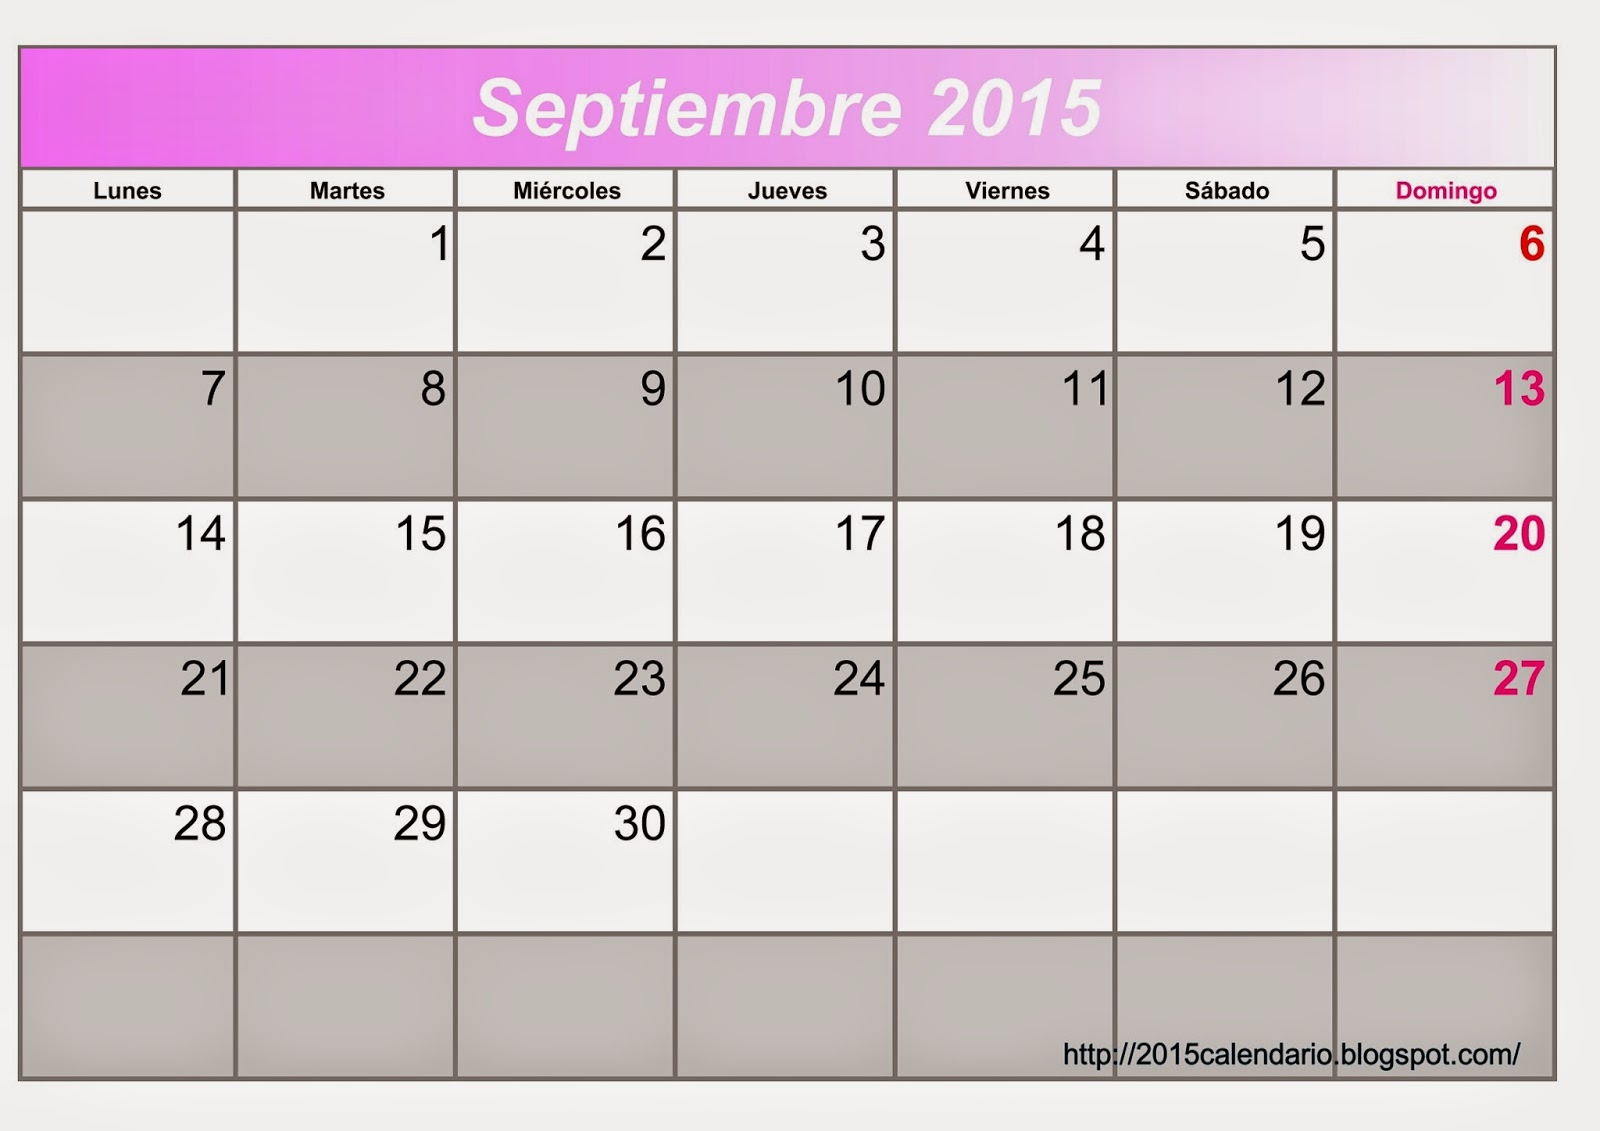 Calendario 2015 Para Imprimir, Descargar Plantilla regarding Calendario 2015 Para Imprimir